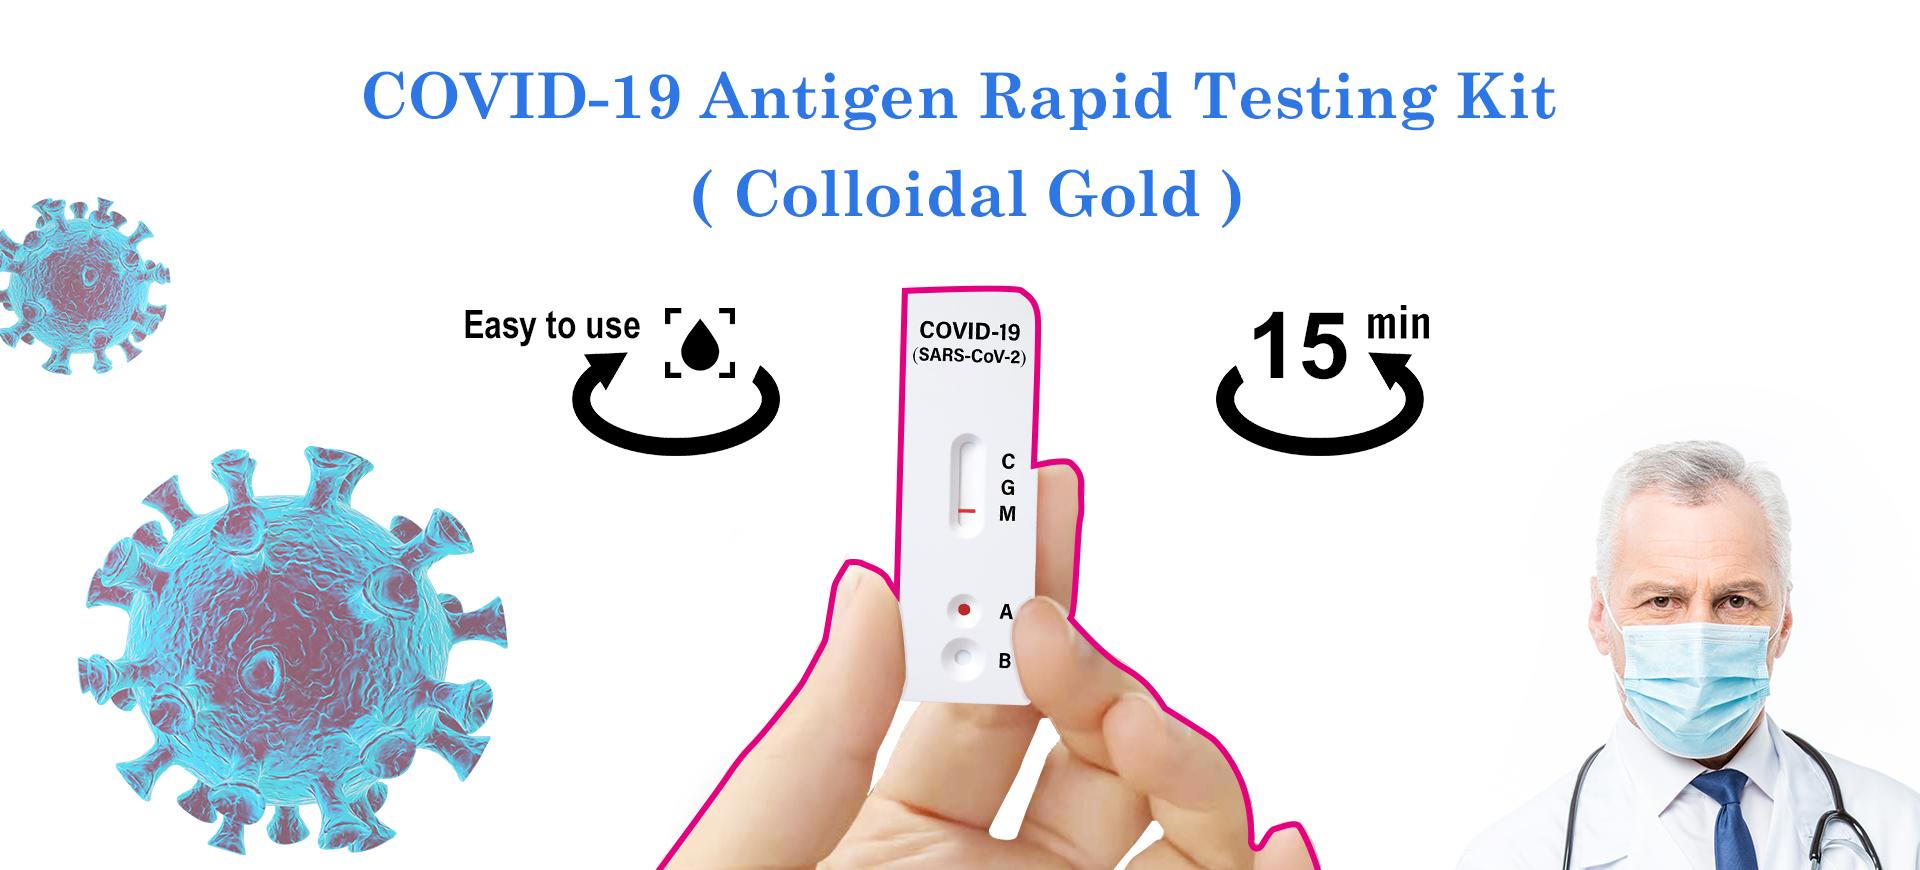 COVID-19 ANTIGEN RAPID TESTING KIT COLLOIDAL GOLD